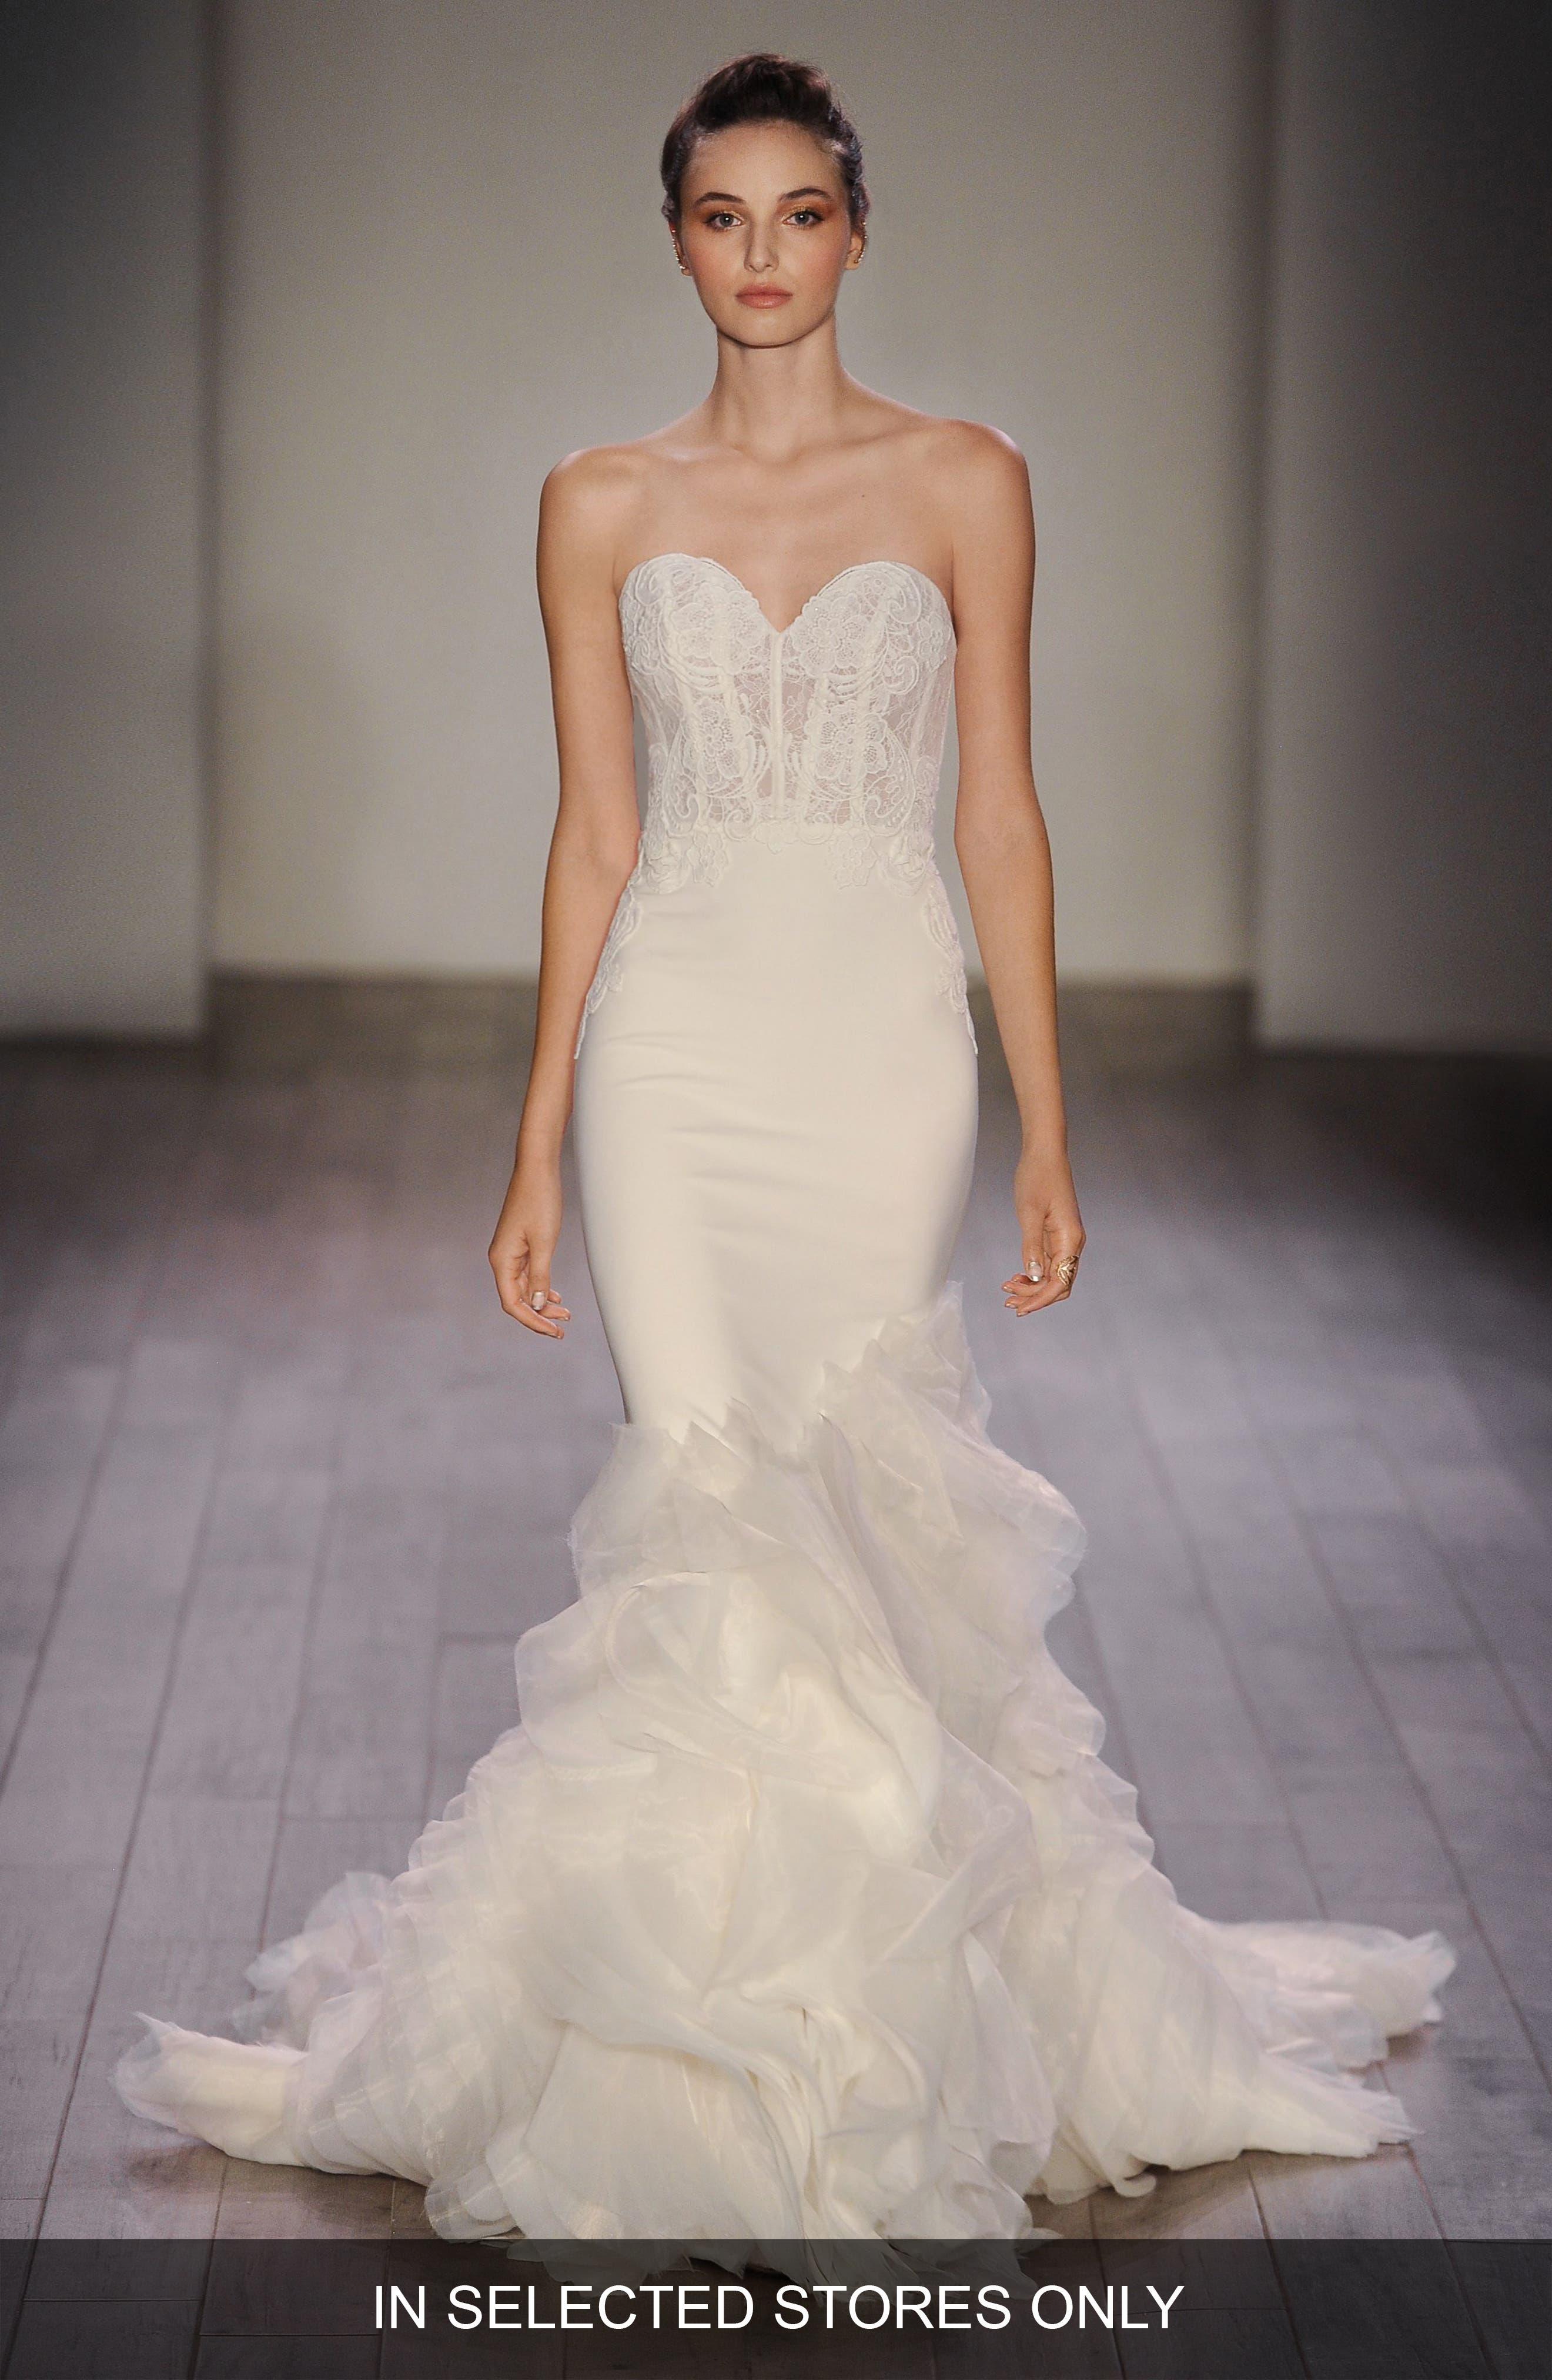 Lazaro Wedding Dresses & Bridal Gowns   Nordstrom